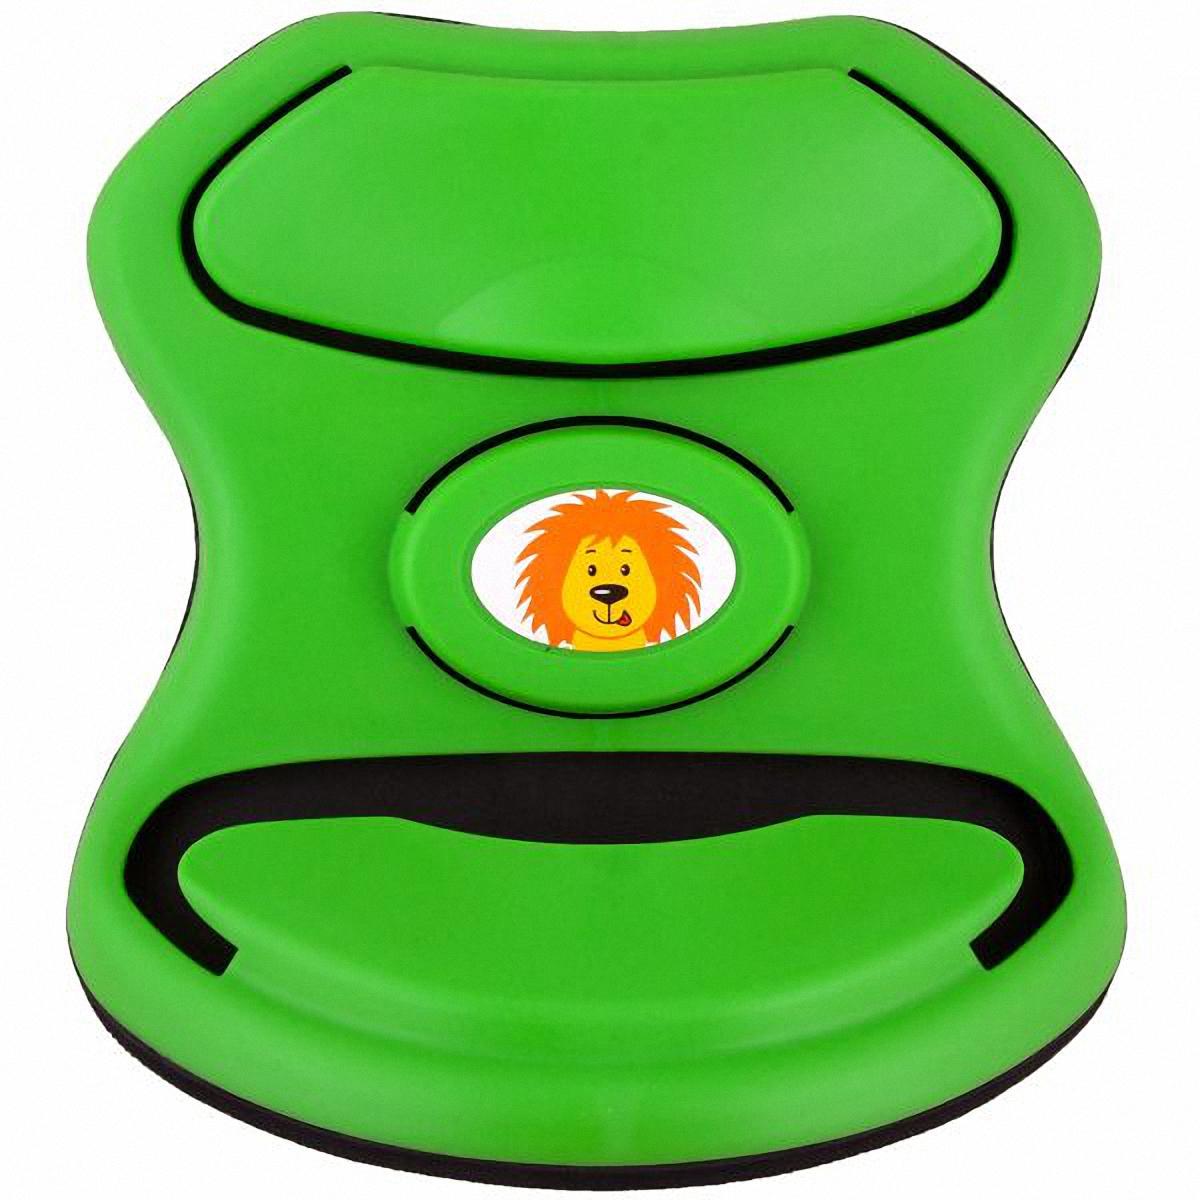 Адаптер ремня безопасности Skyway, цвет: зеленый. S04004002